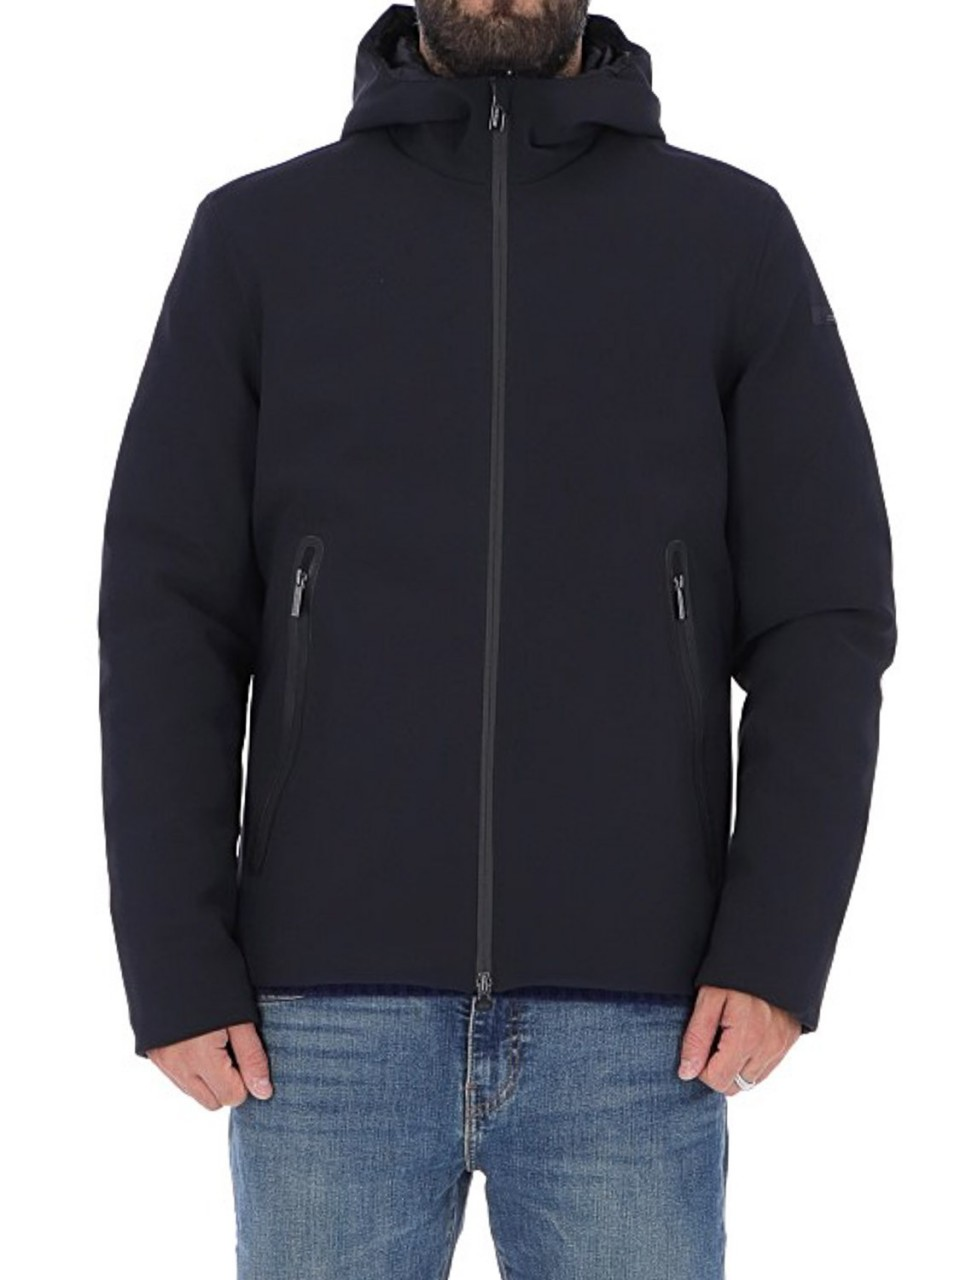 Rrd Uomo Giacca Roberto Ricci Design Uomo Winter Storm Hood W19001M